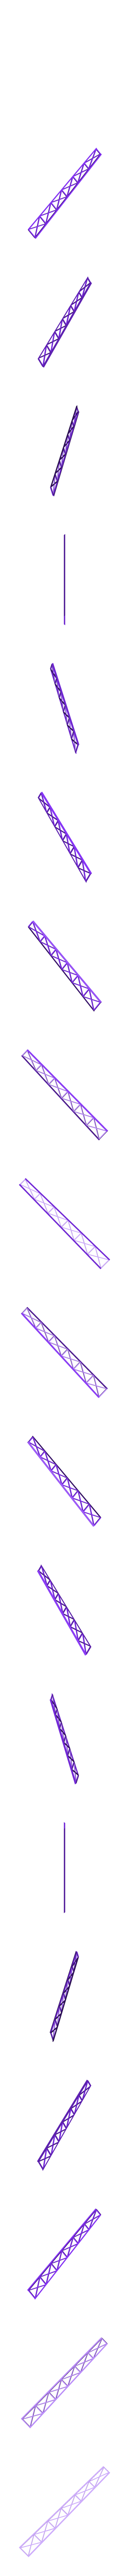 Tower_Segments_3.stl Download free STL file HO Scale 68' Yard Light Tower • 3D printer model, kabrumble